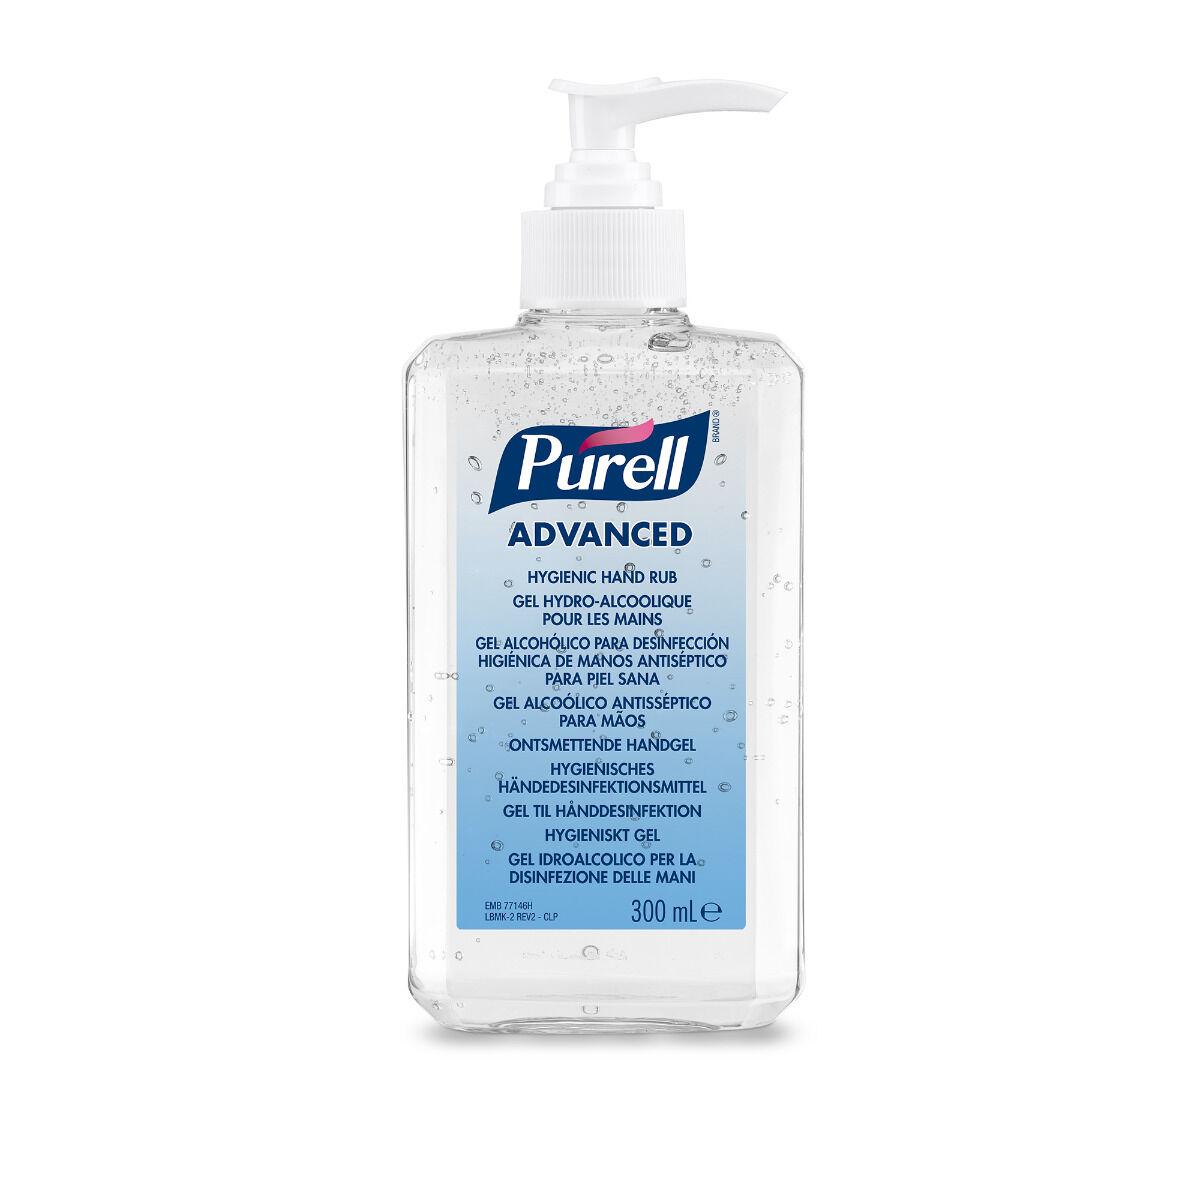 Wet Ones Extra Gentle Sensitive Skin Unscented Hand Wipes 20ct